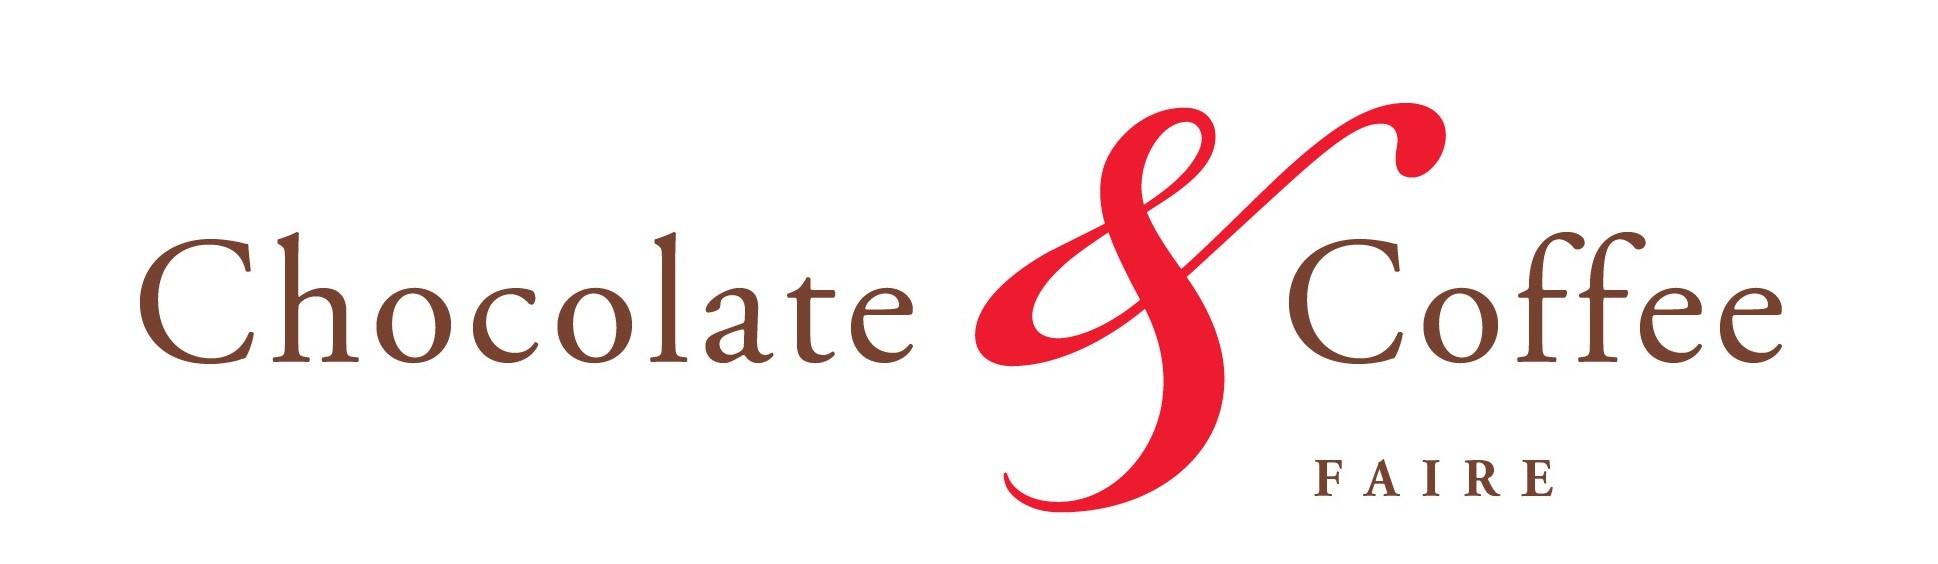 Chocolate & Chocolate Faire Logo